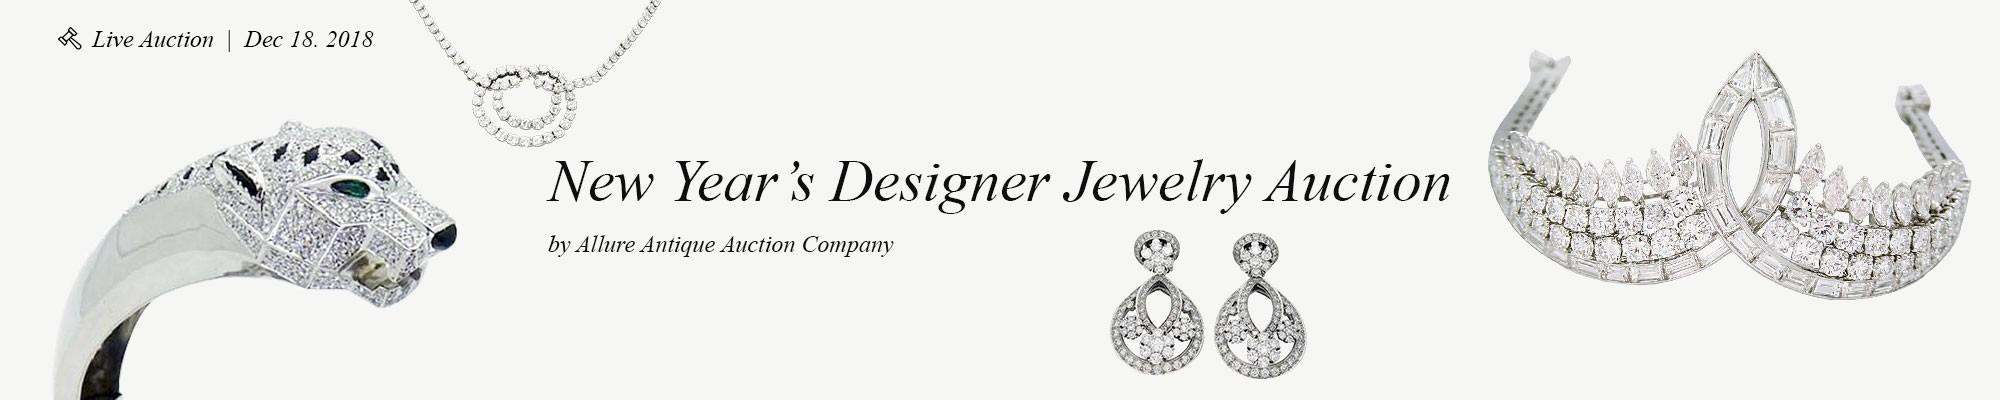 estate-designer-jewelry-auction-allure-antique-auction-company